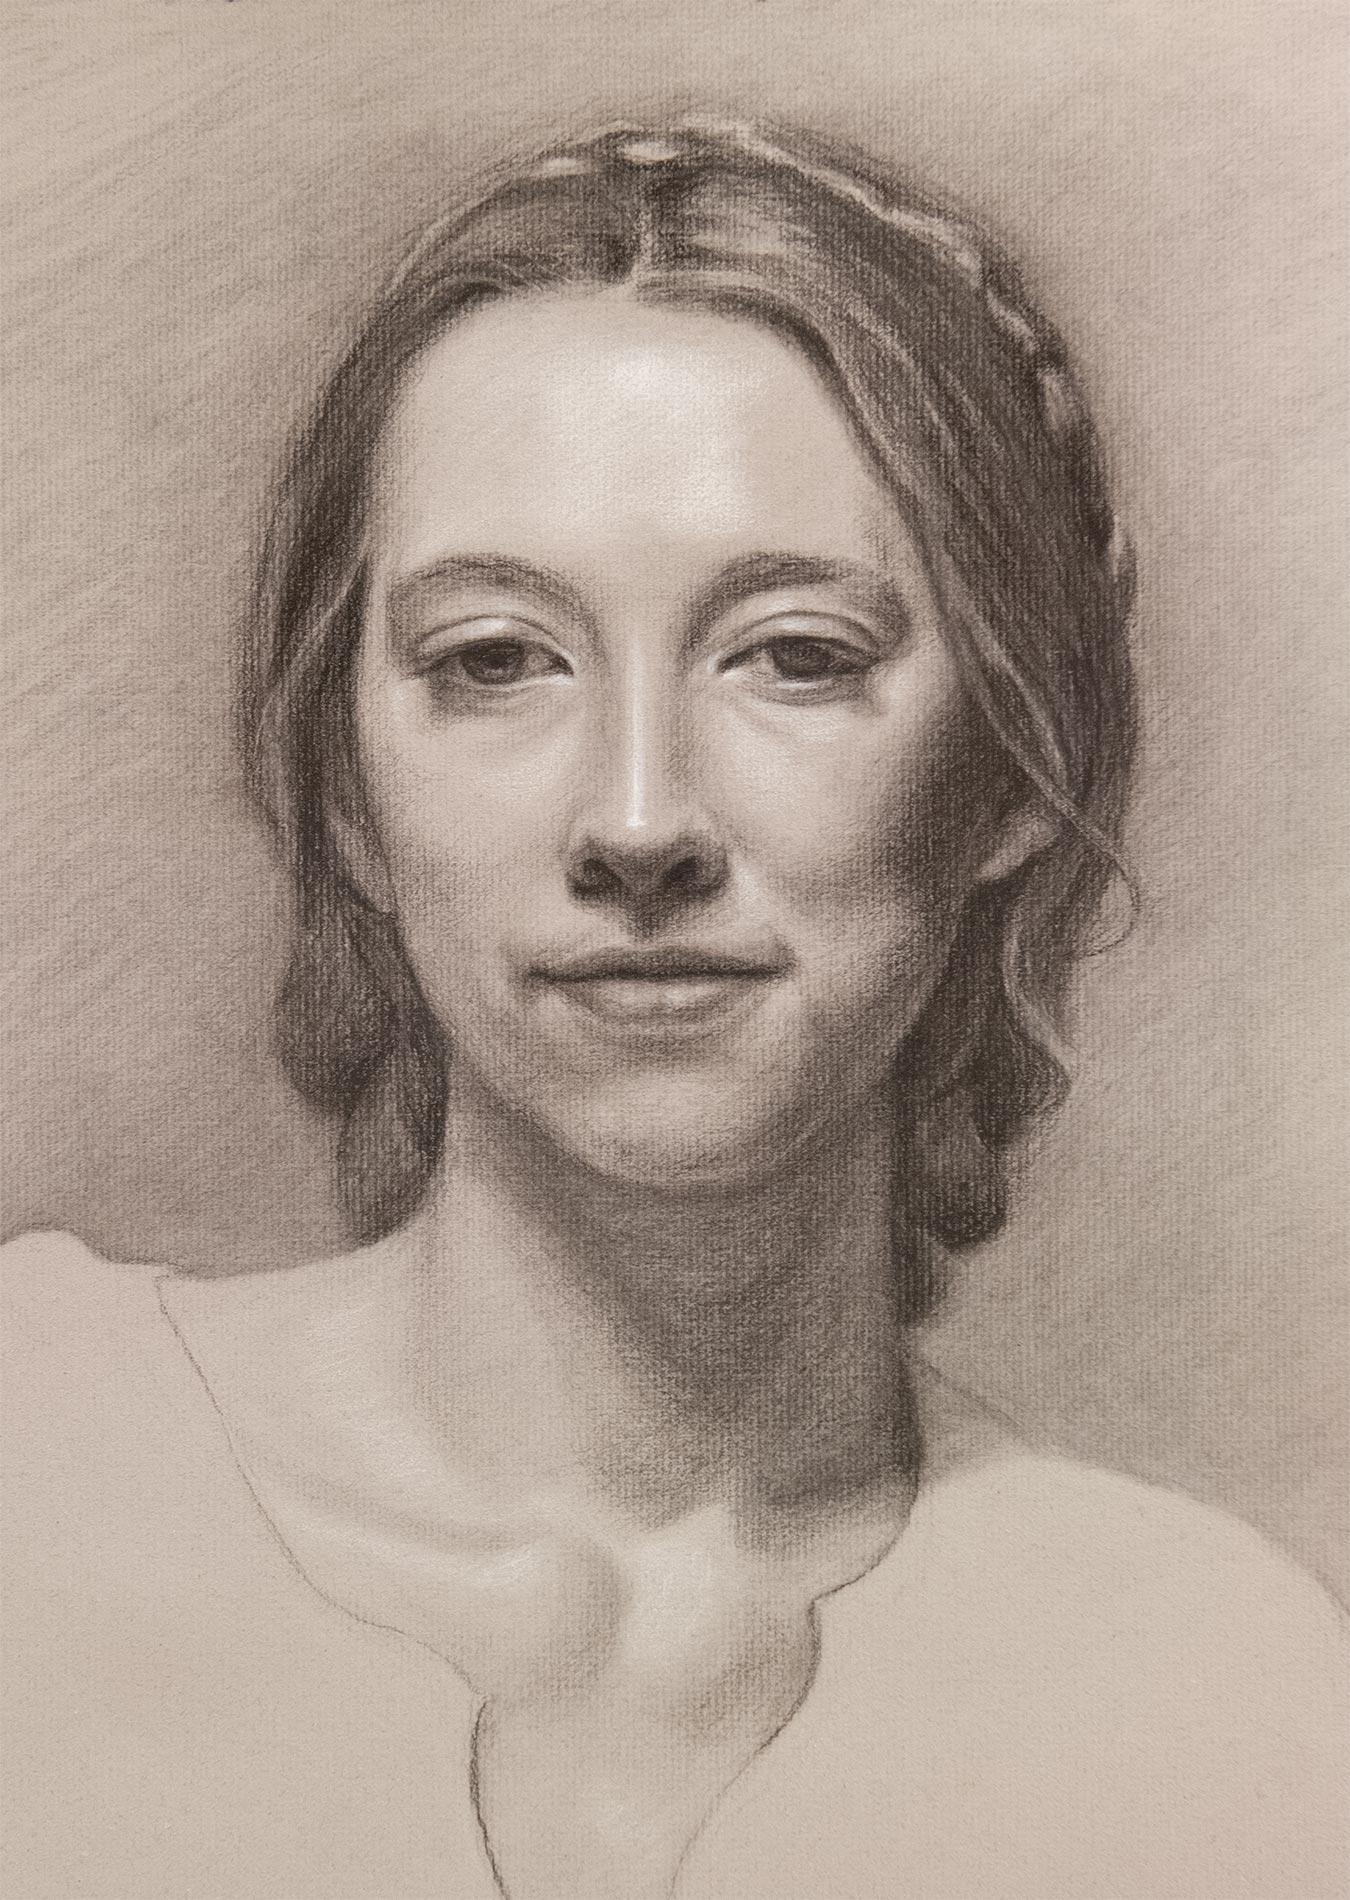 Online Portrait Drawing Workshop with Marvin Mattelson